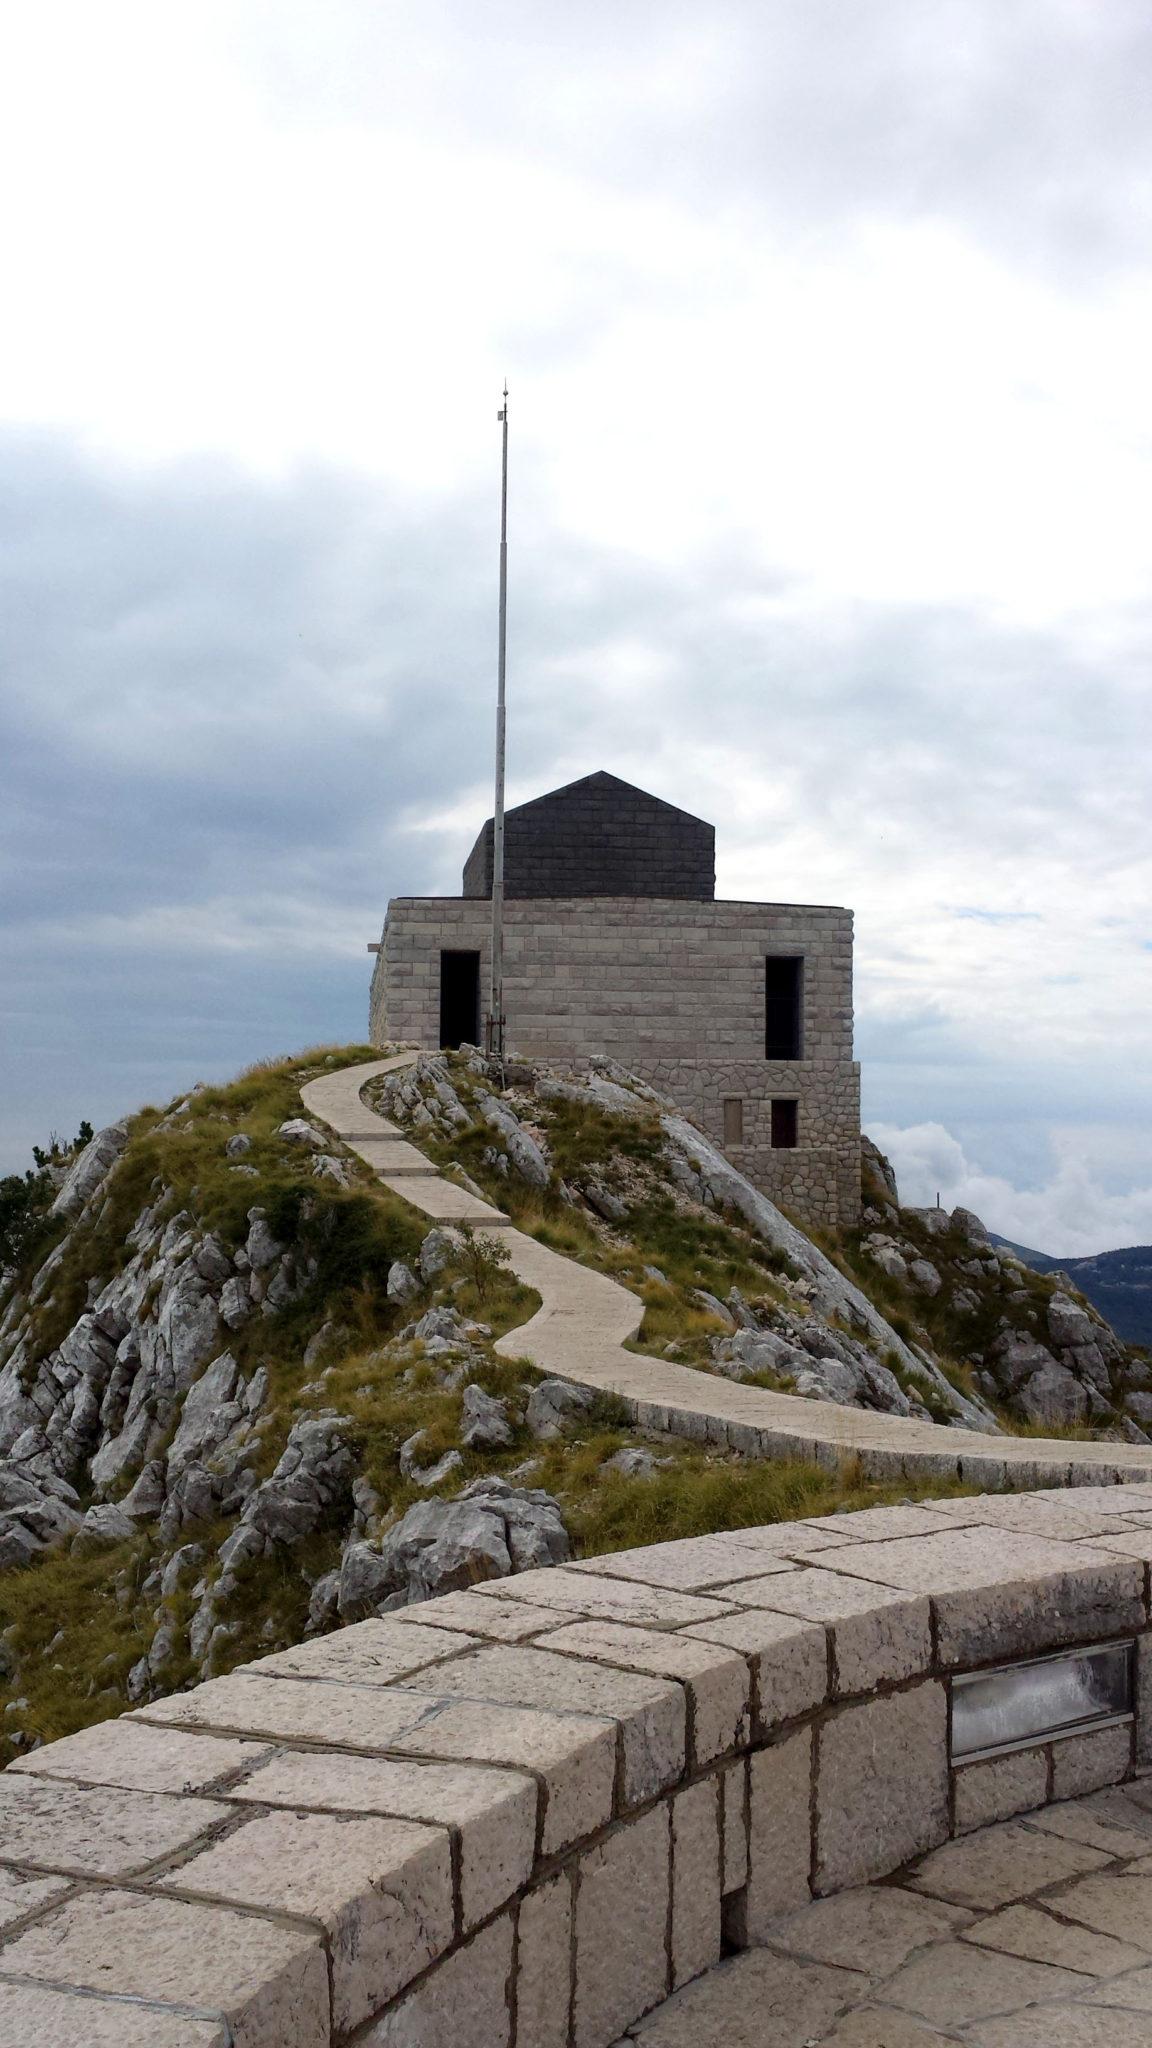 Hema_Le_parc_Lovcen_blog_voyage_travel_mausolee_nejegos11